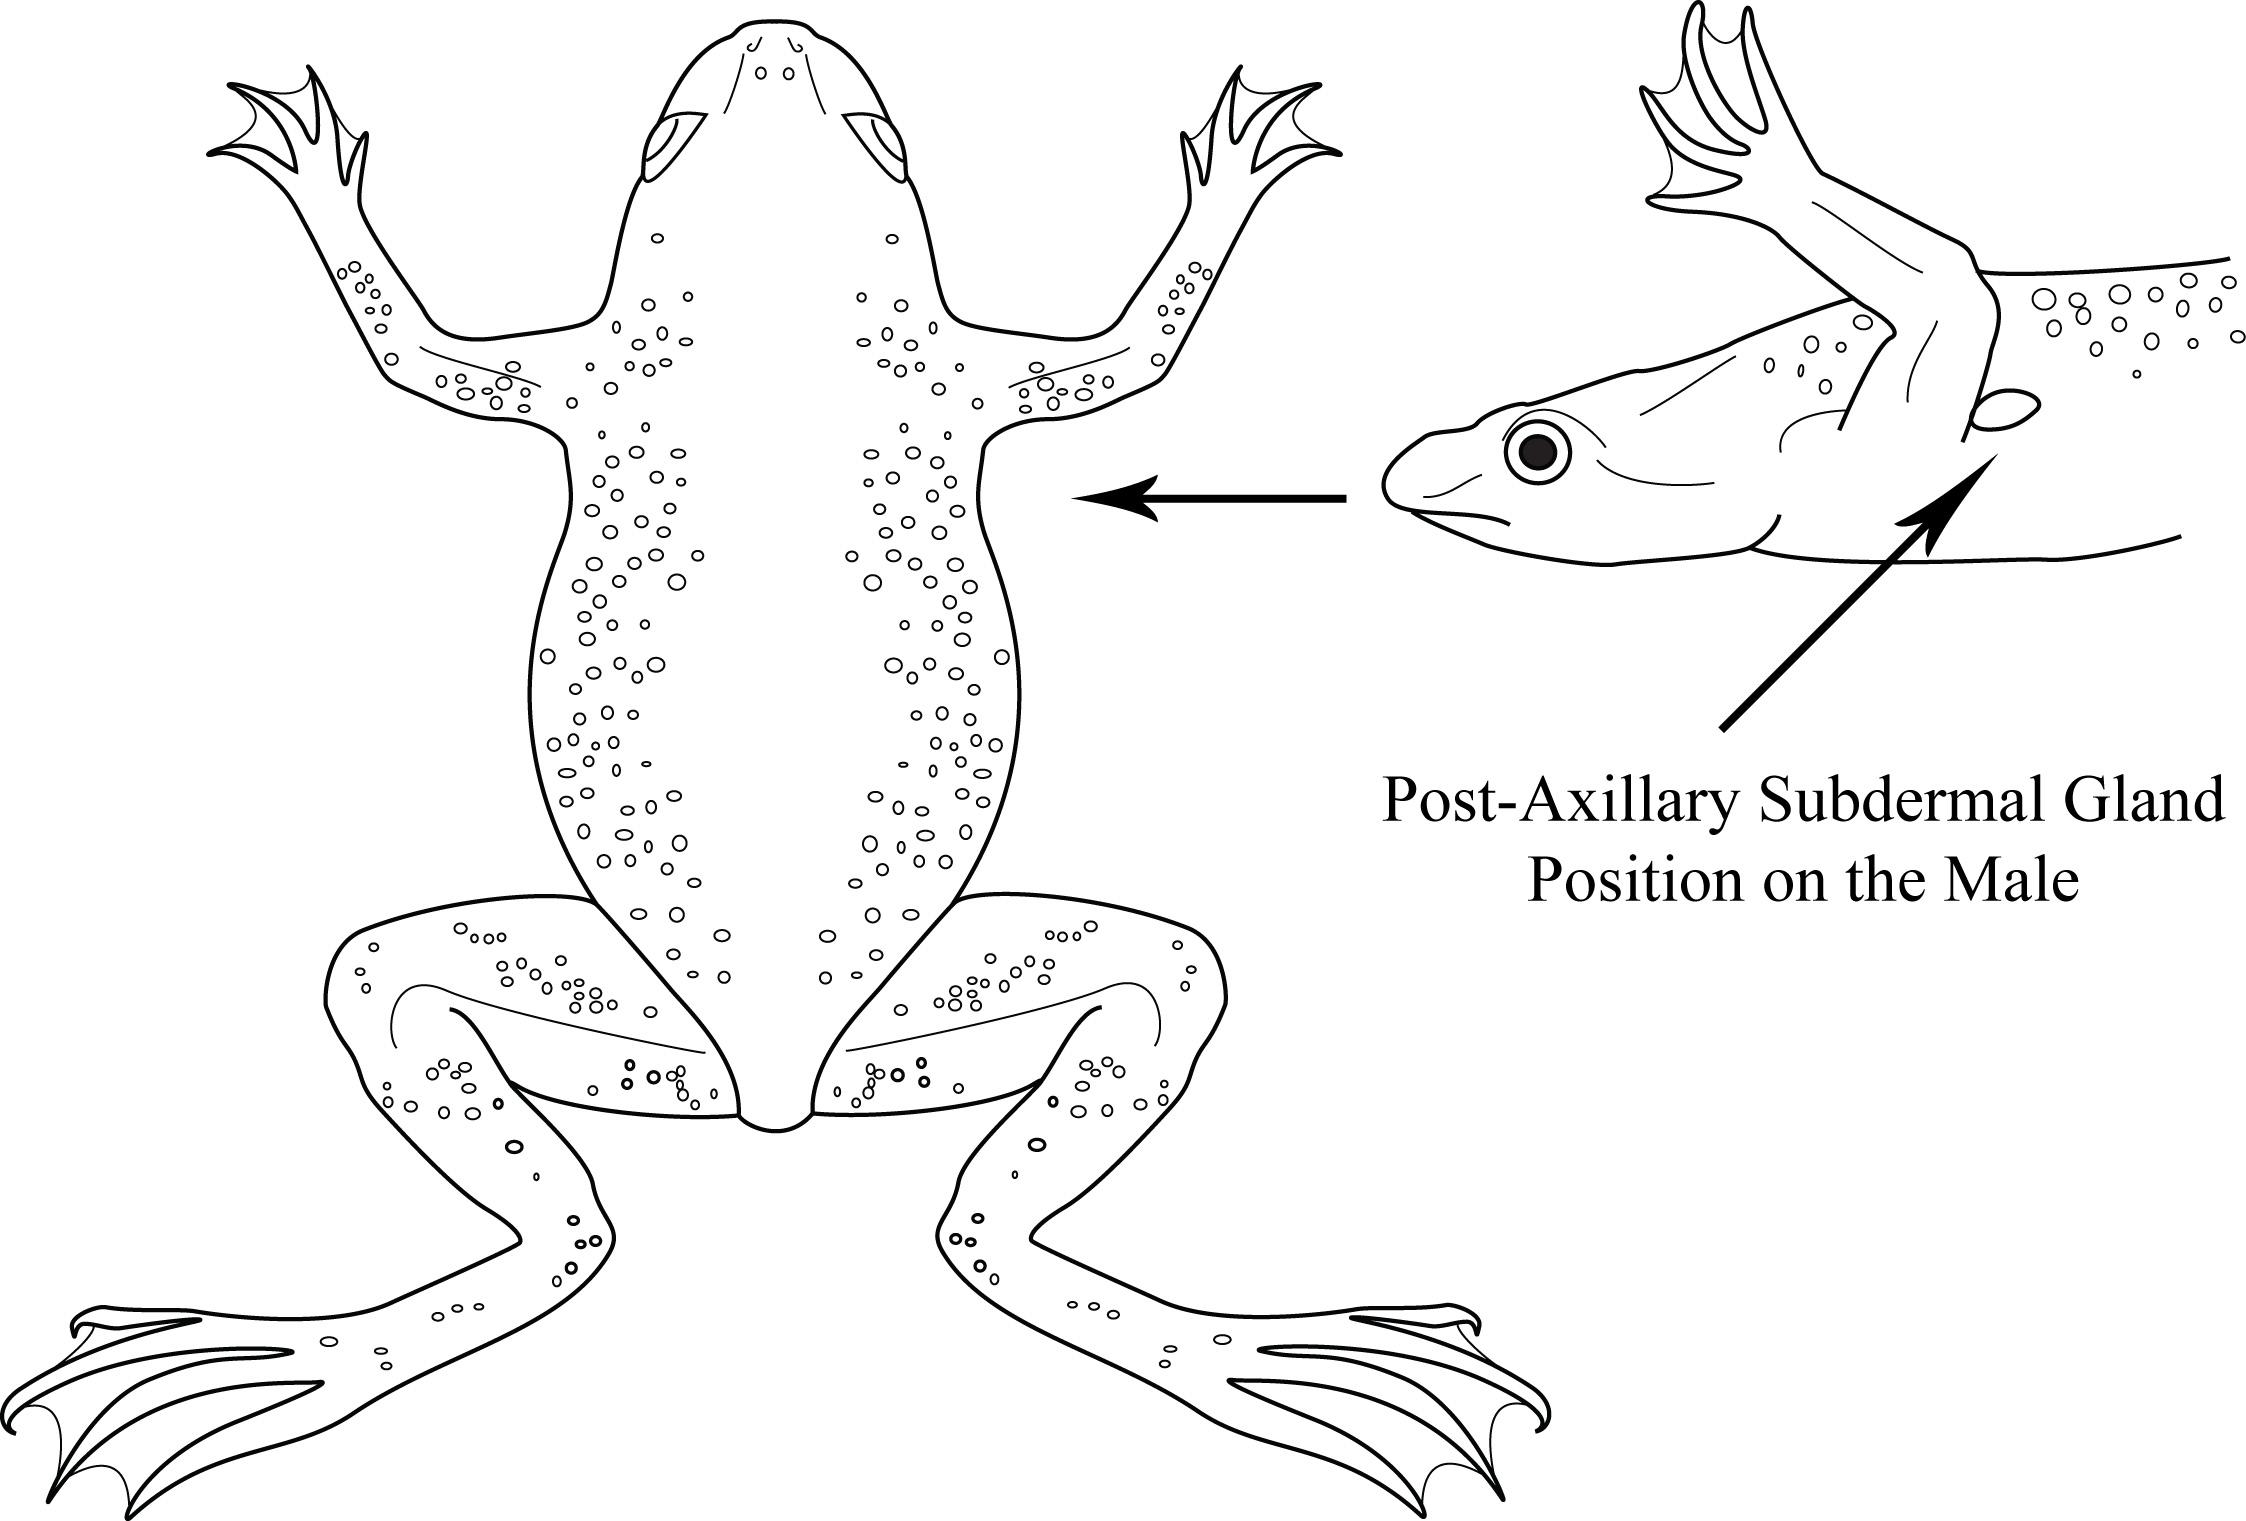 Aquatic Frog Diagrams by Sara Jennings at Coroflot.com